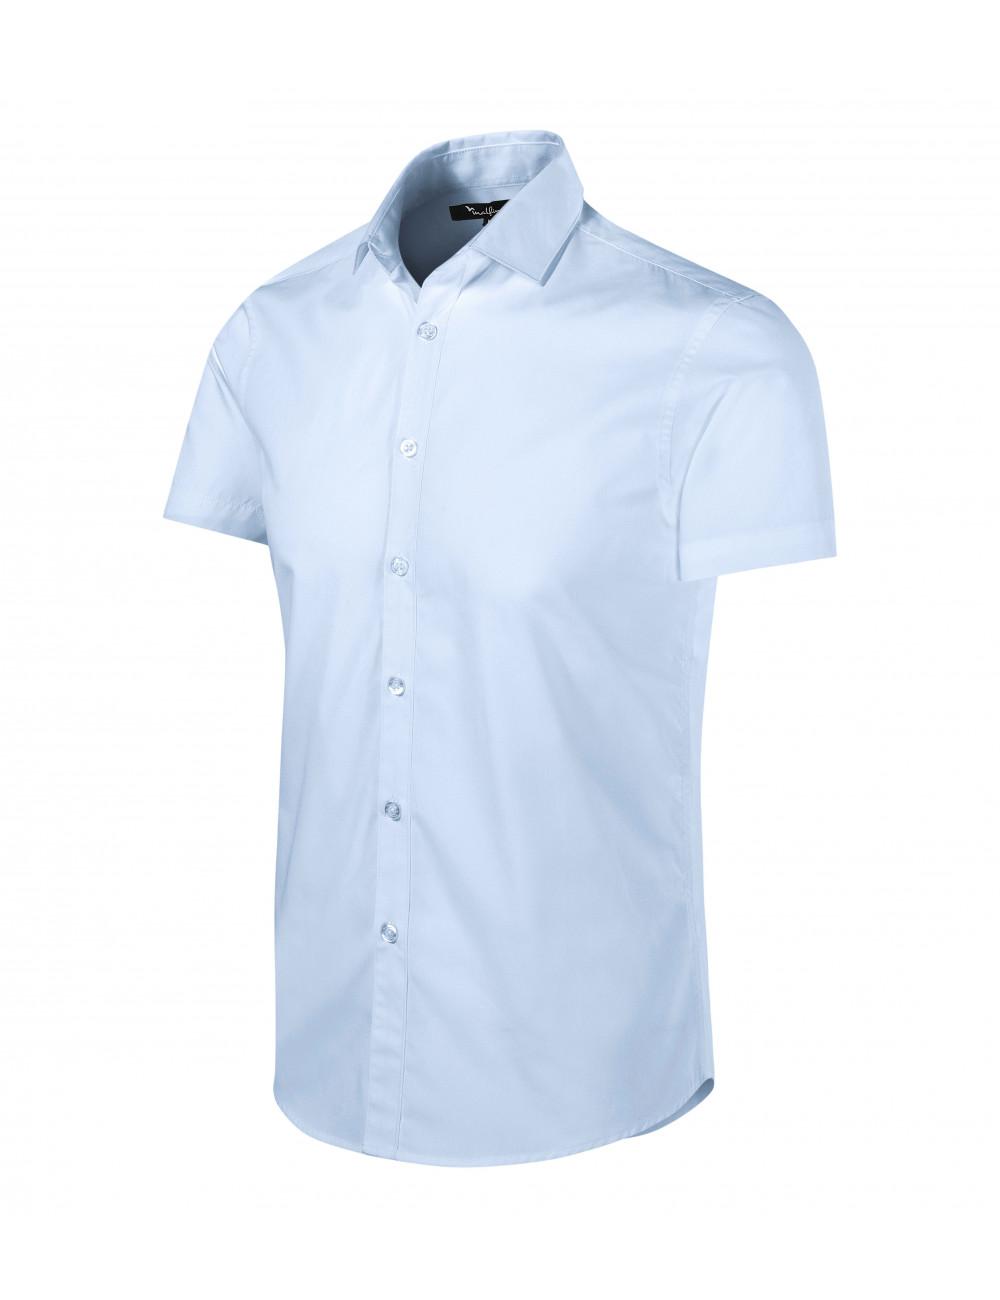 Adler MALFINIPREMIUM Koszula męska Flash 260 light blue